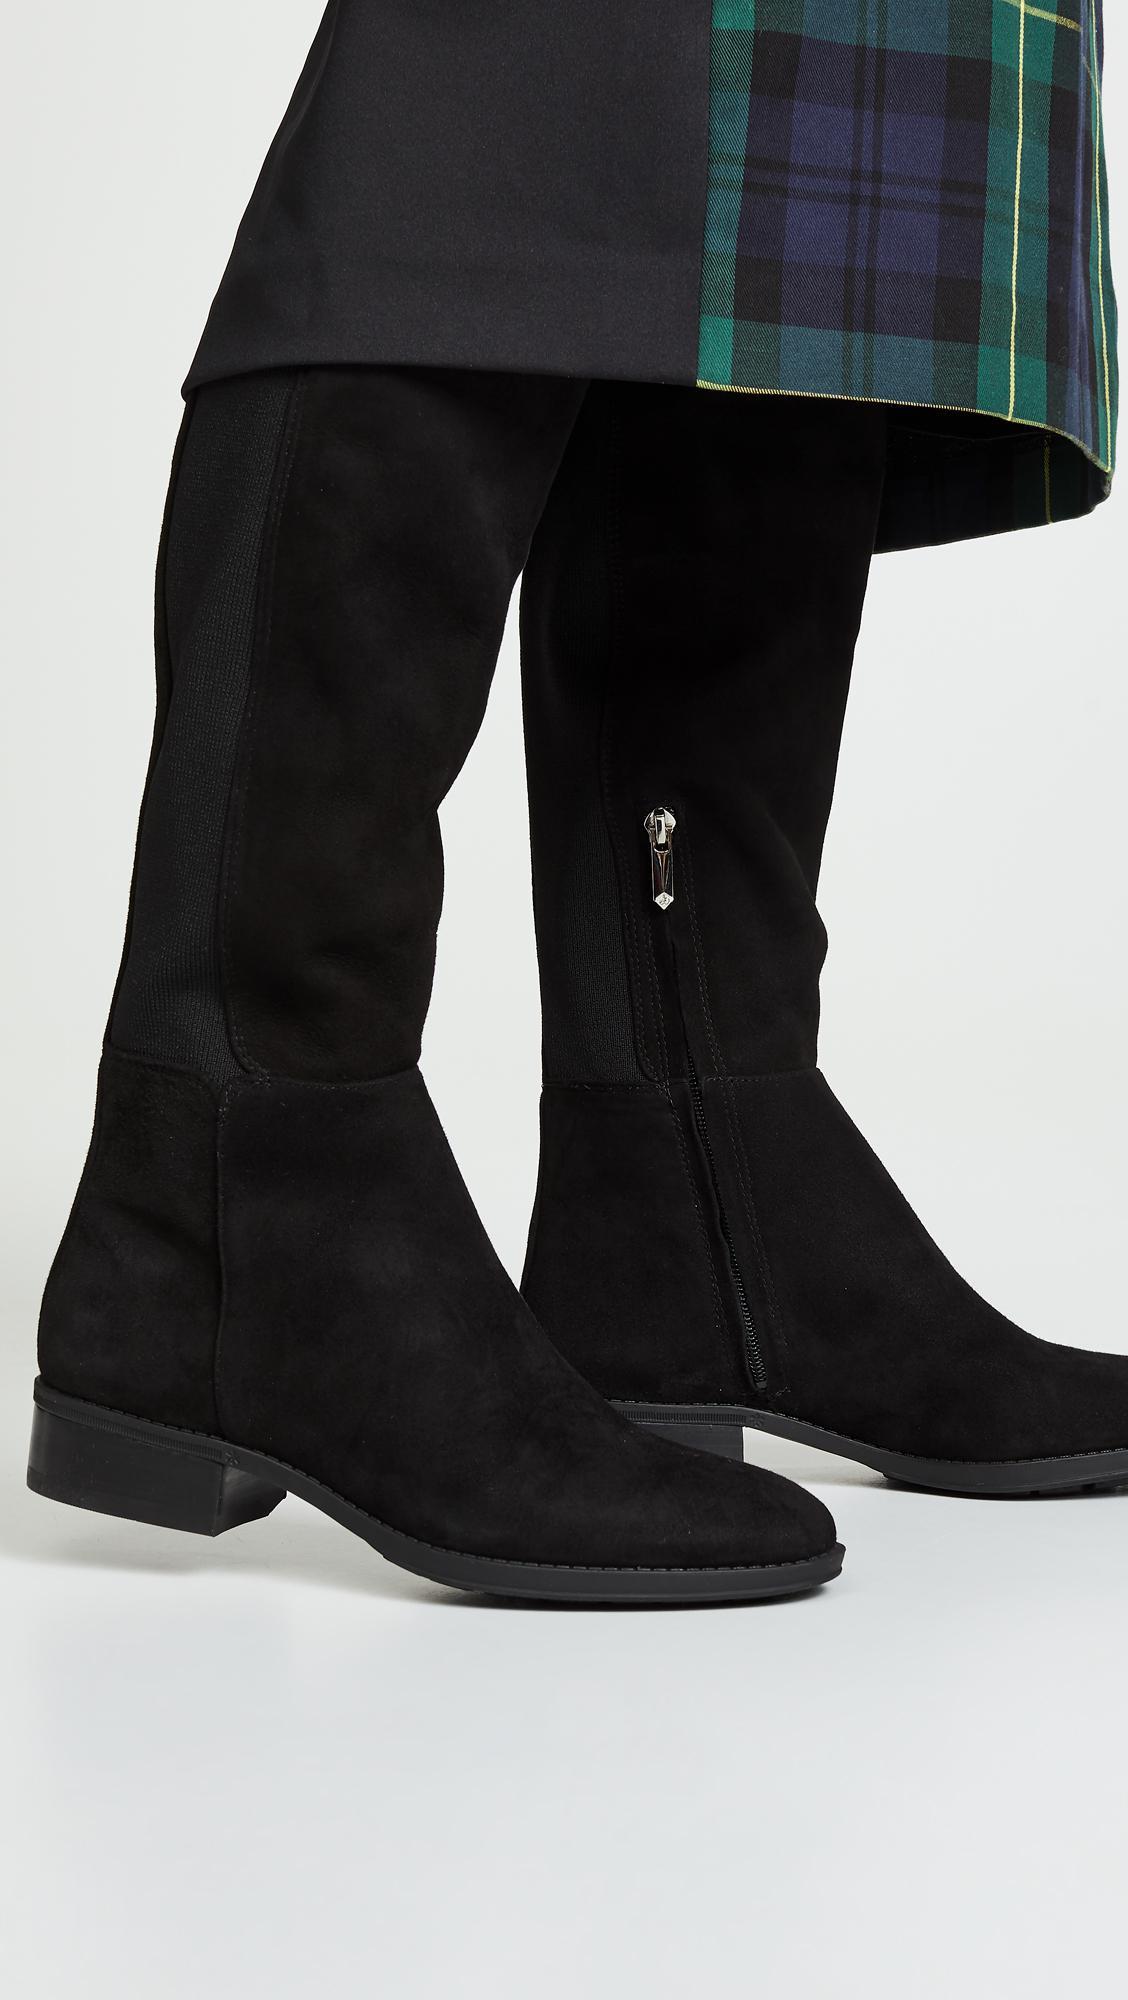 00901391023 Lyst - Sam Edelman Pam Boots in Black